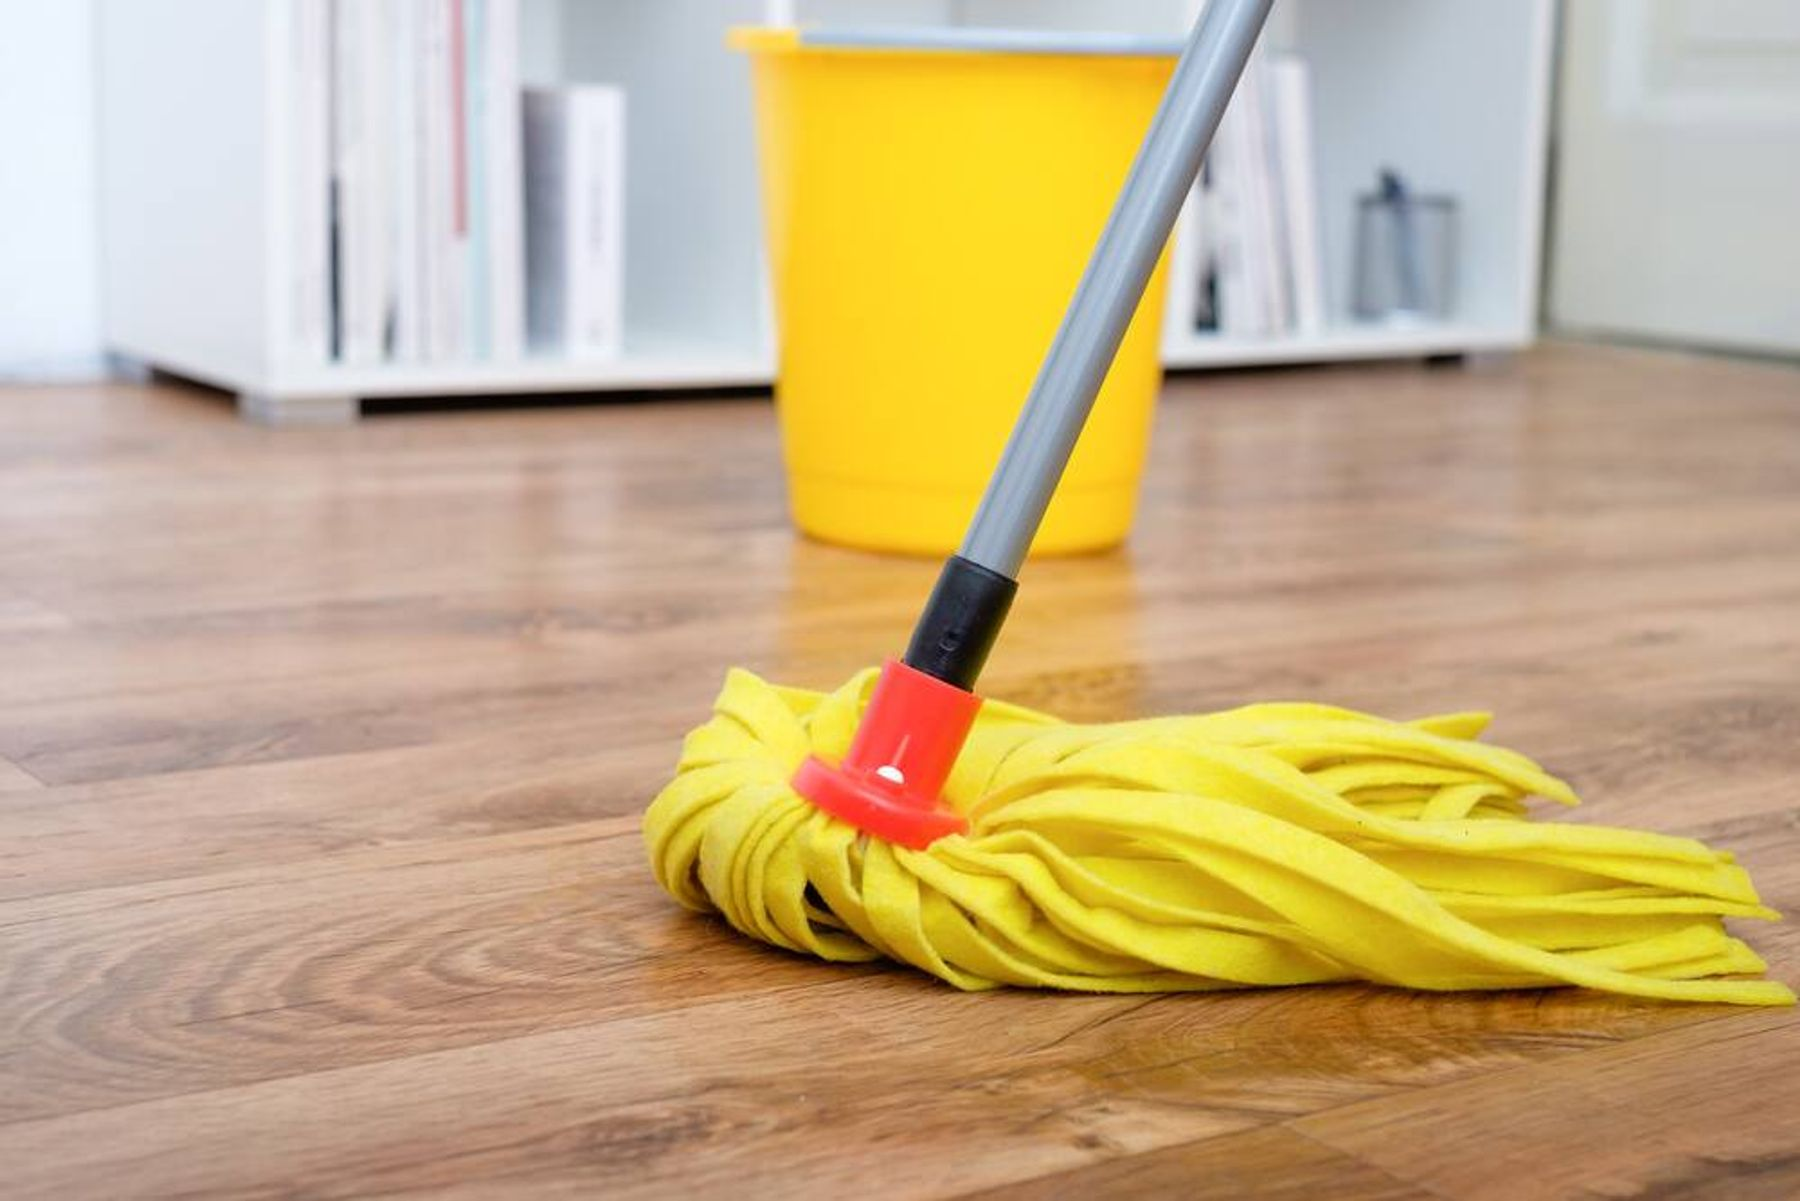 Cara merawat berbagai macam alat kebersihan rumah